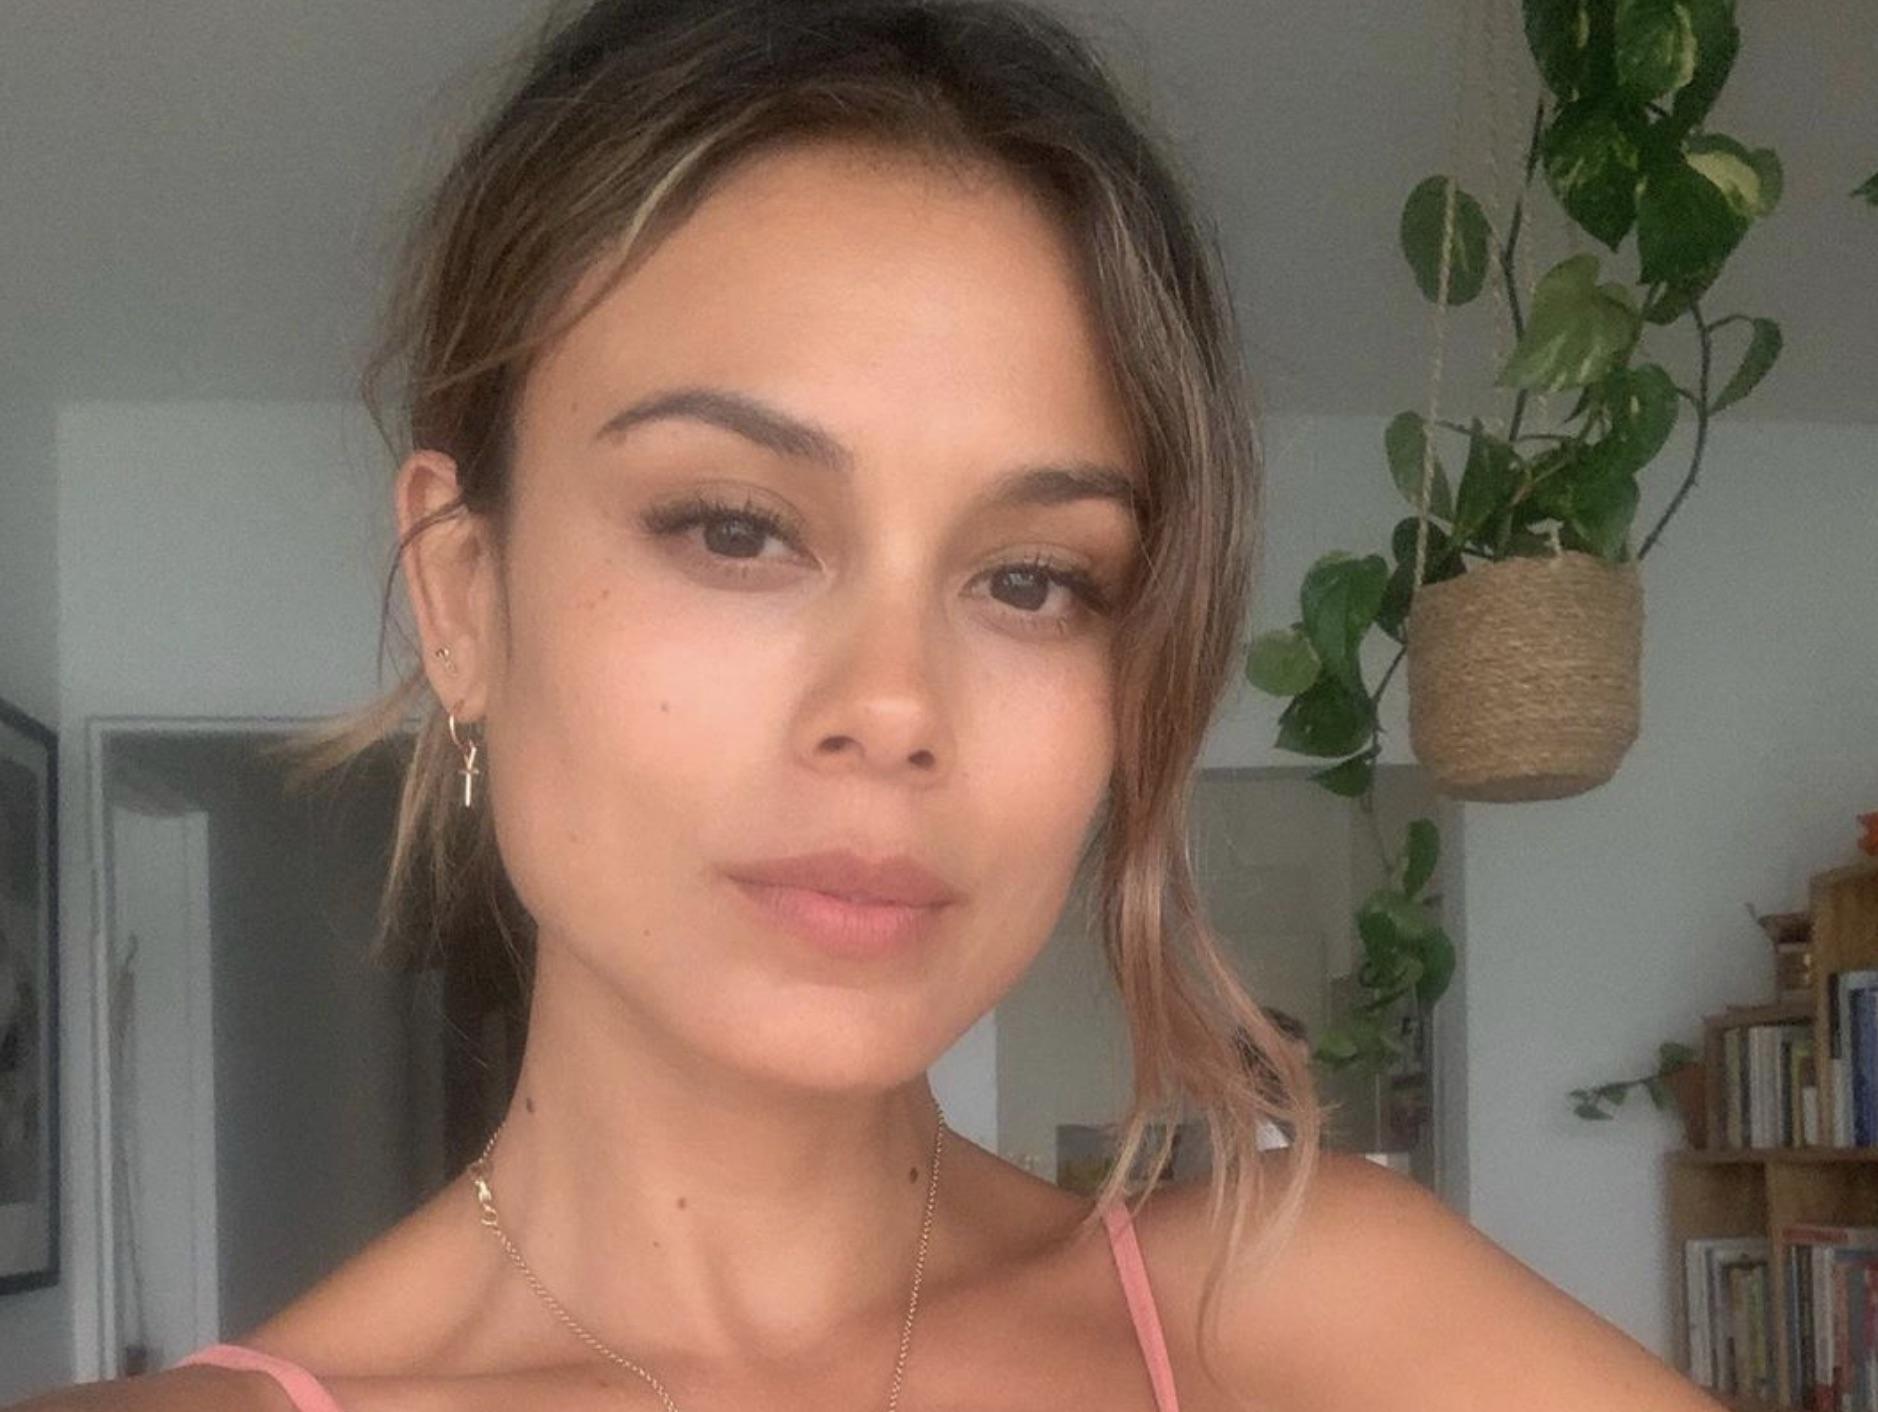 Nathalie Kelley, Dynasty, Baker and the Beauty-https://www.instagram.com/p/B87jYyvJWec/